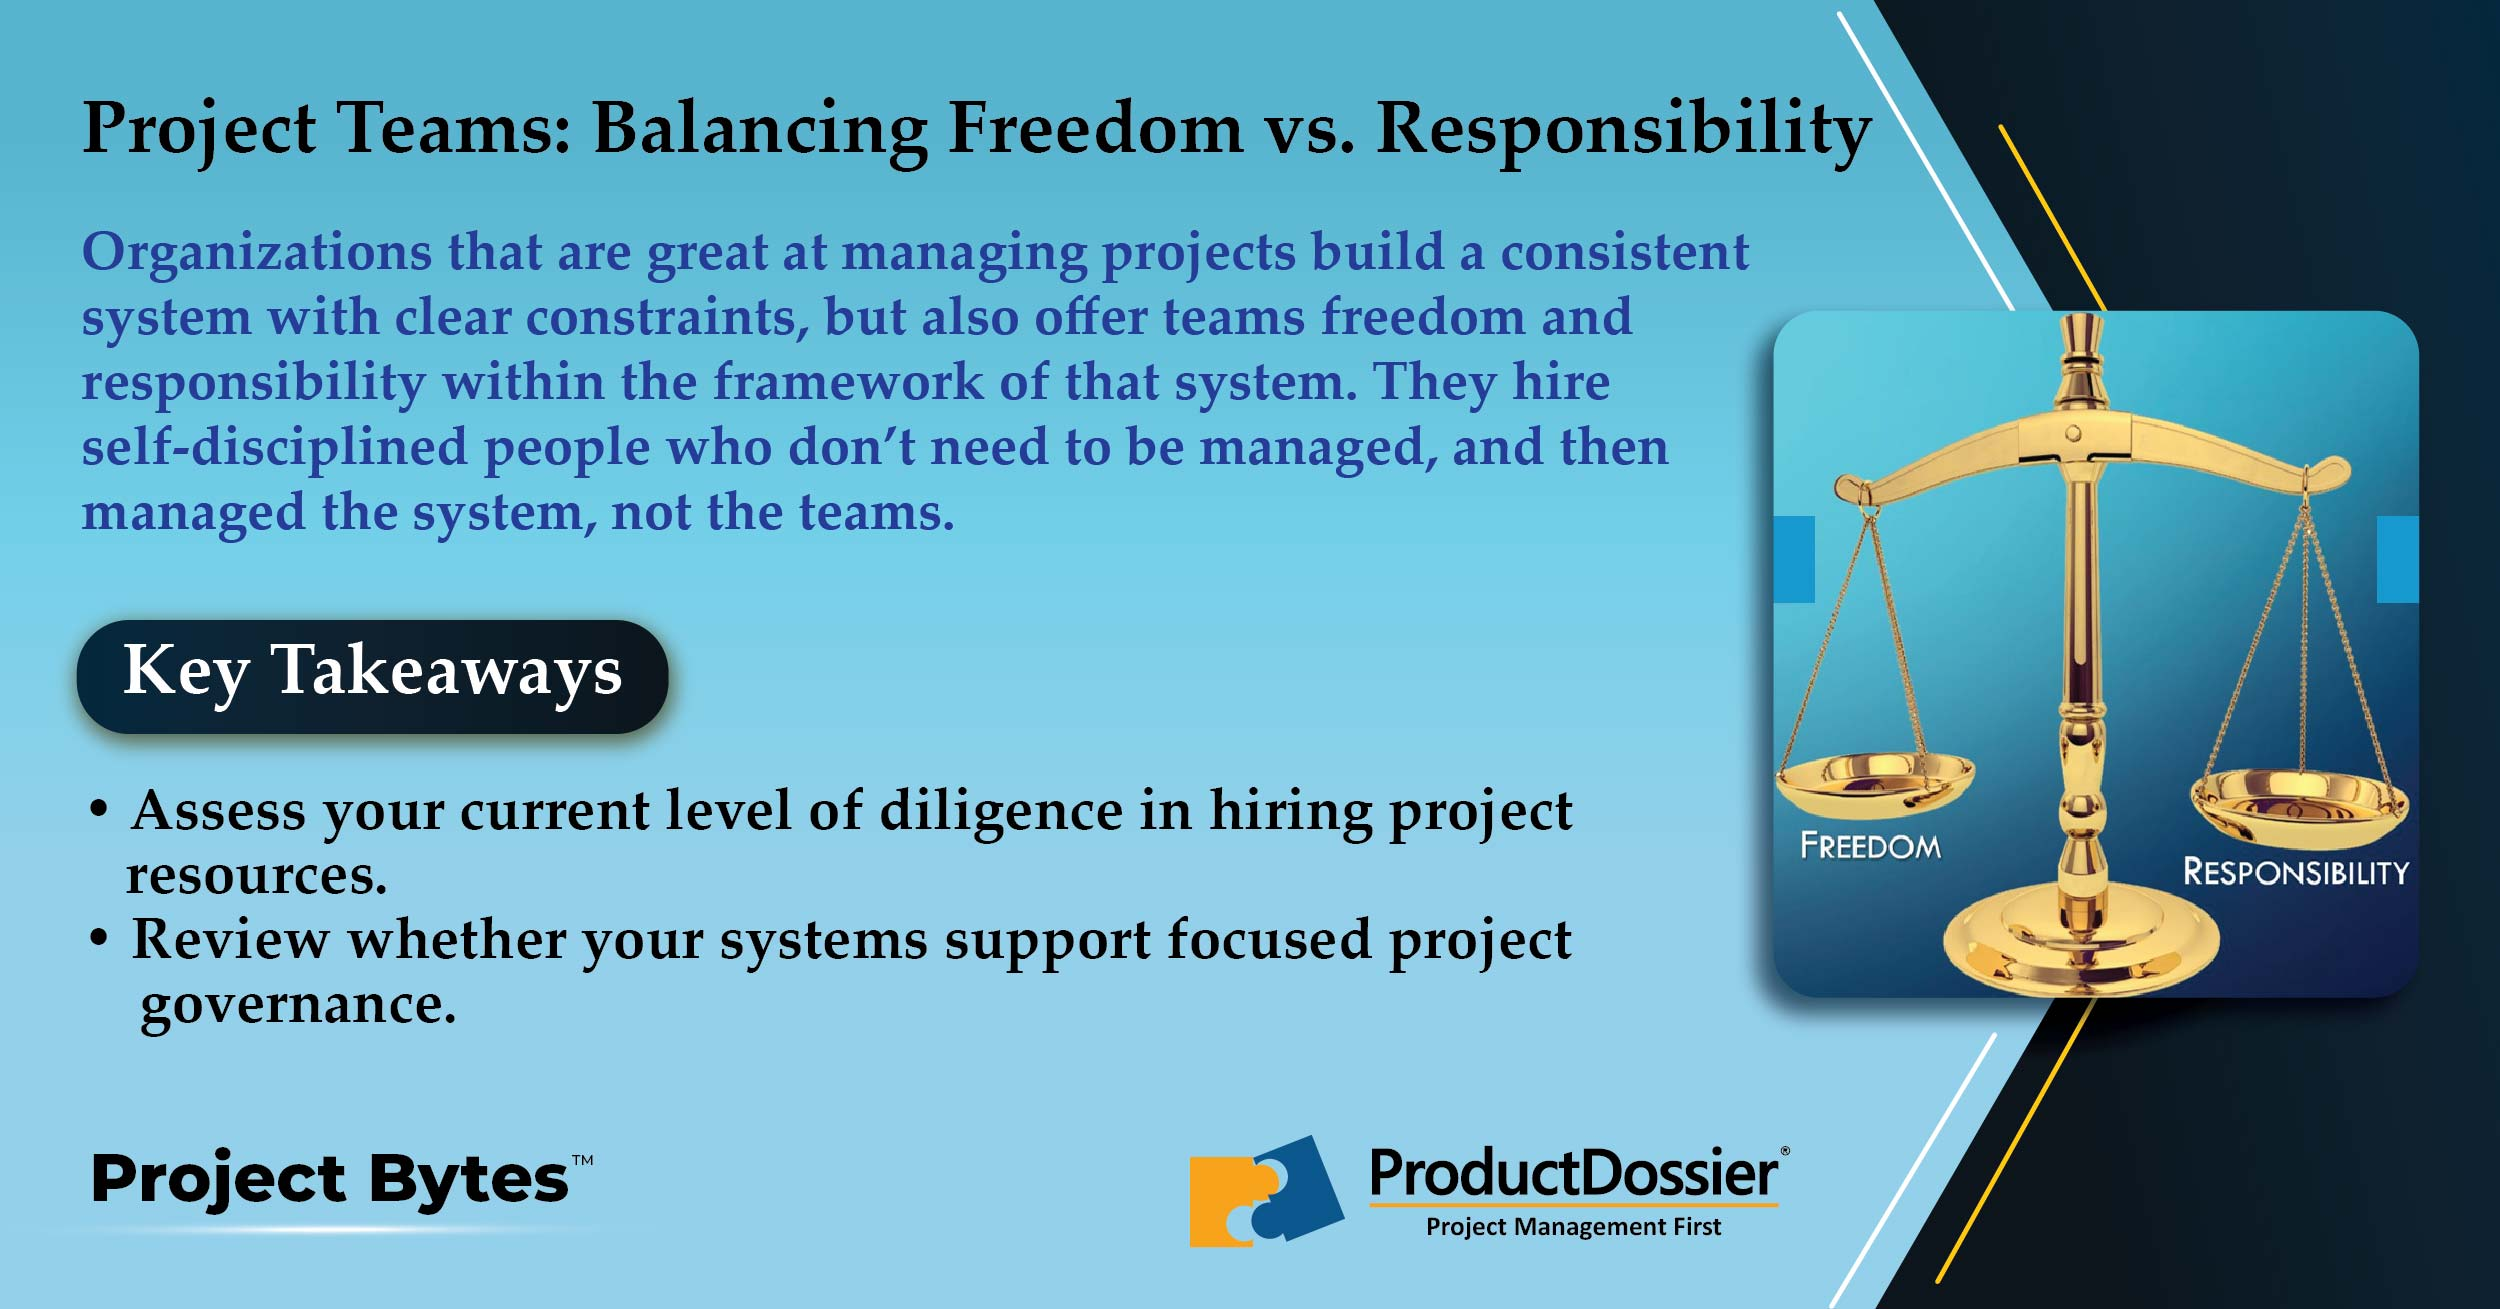 ProductDossier